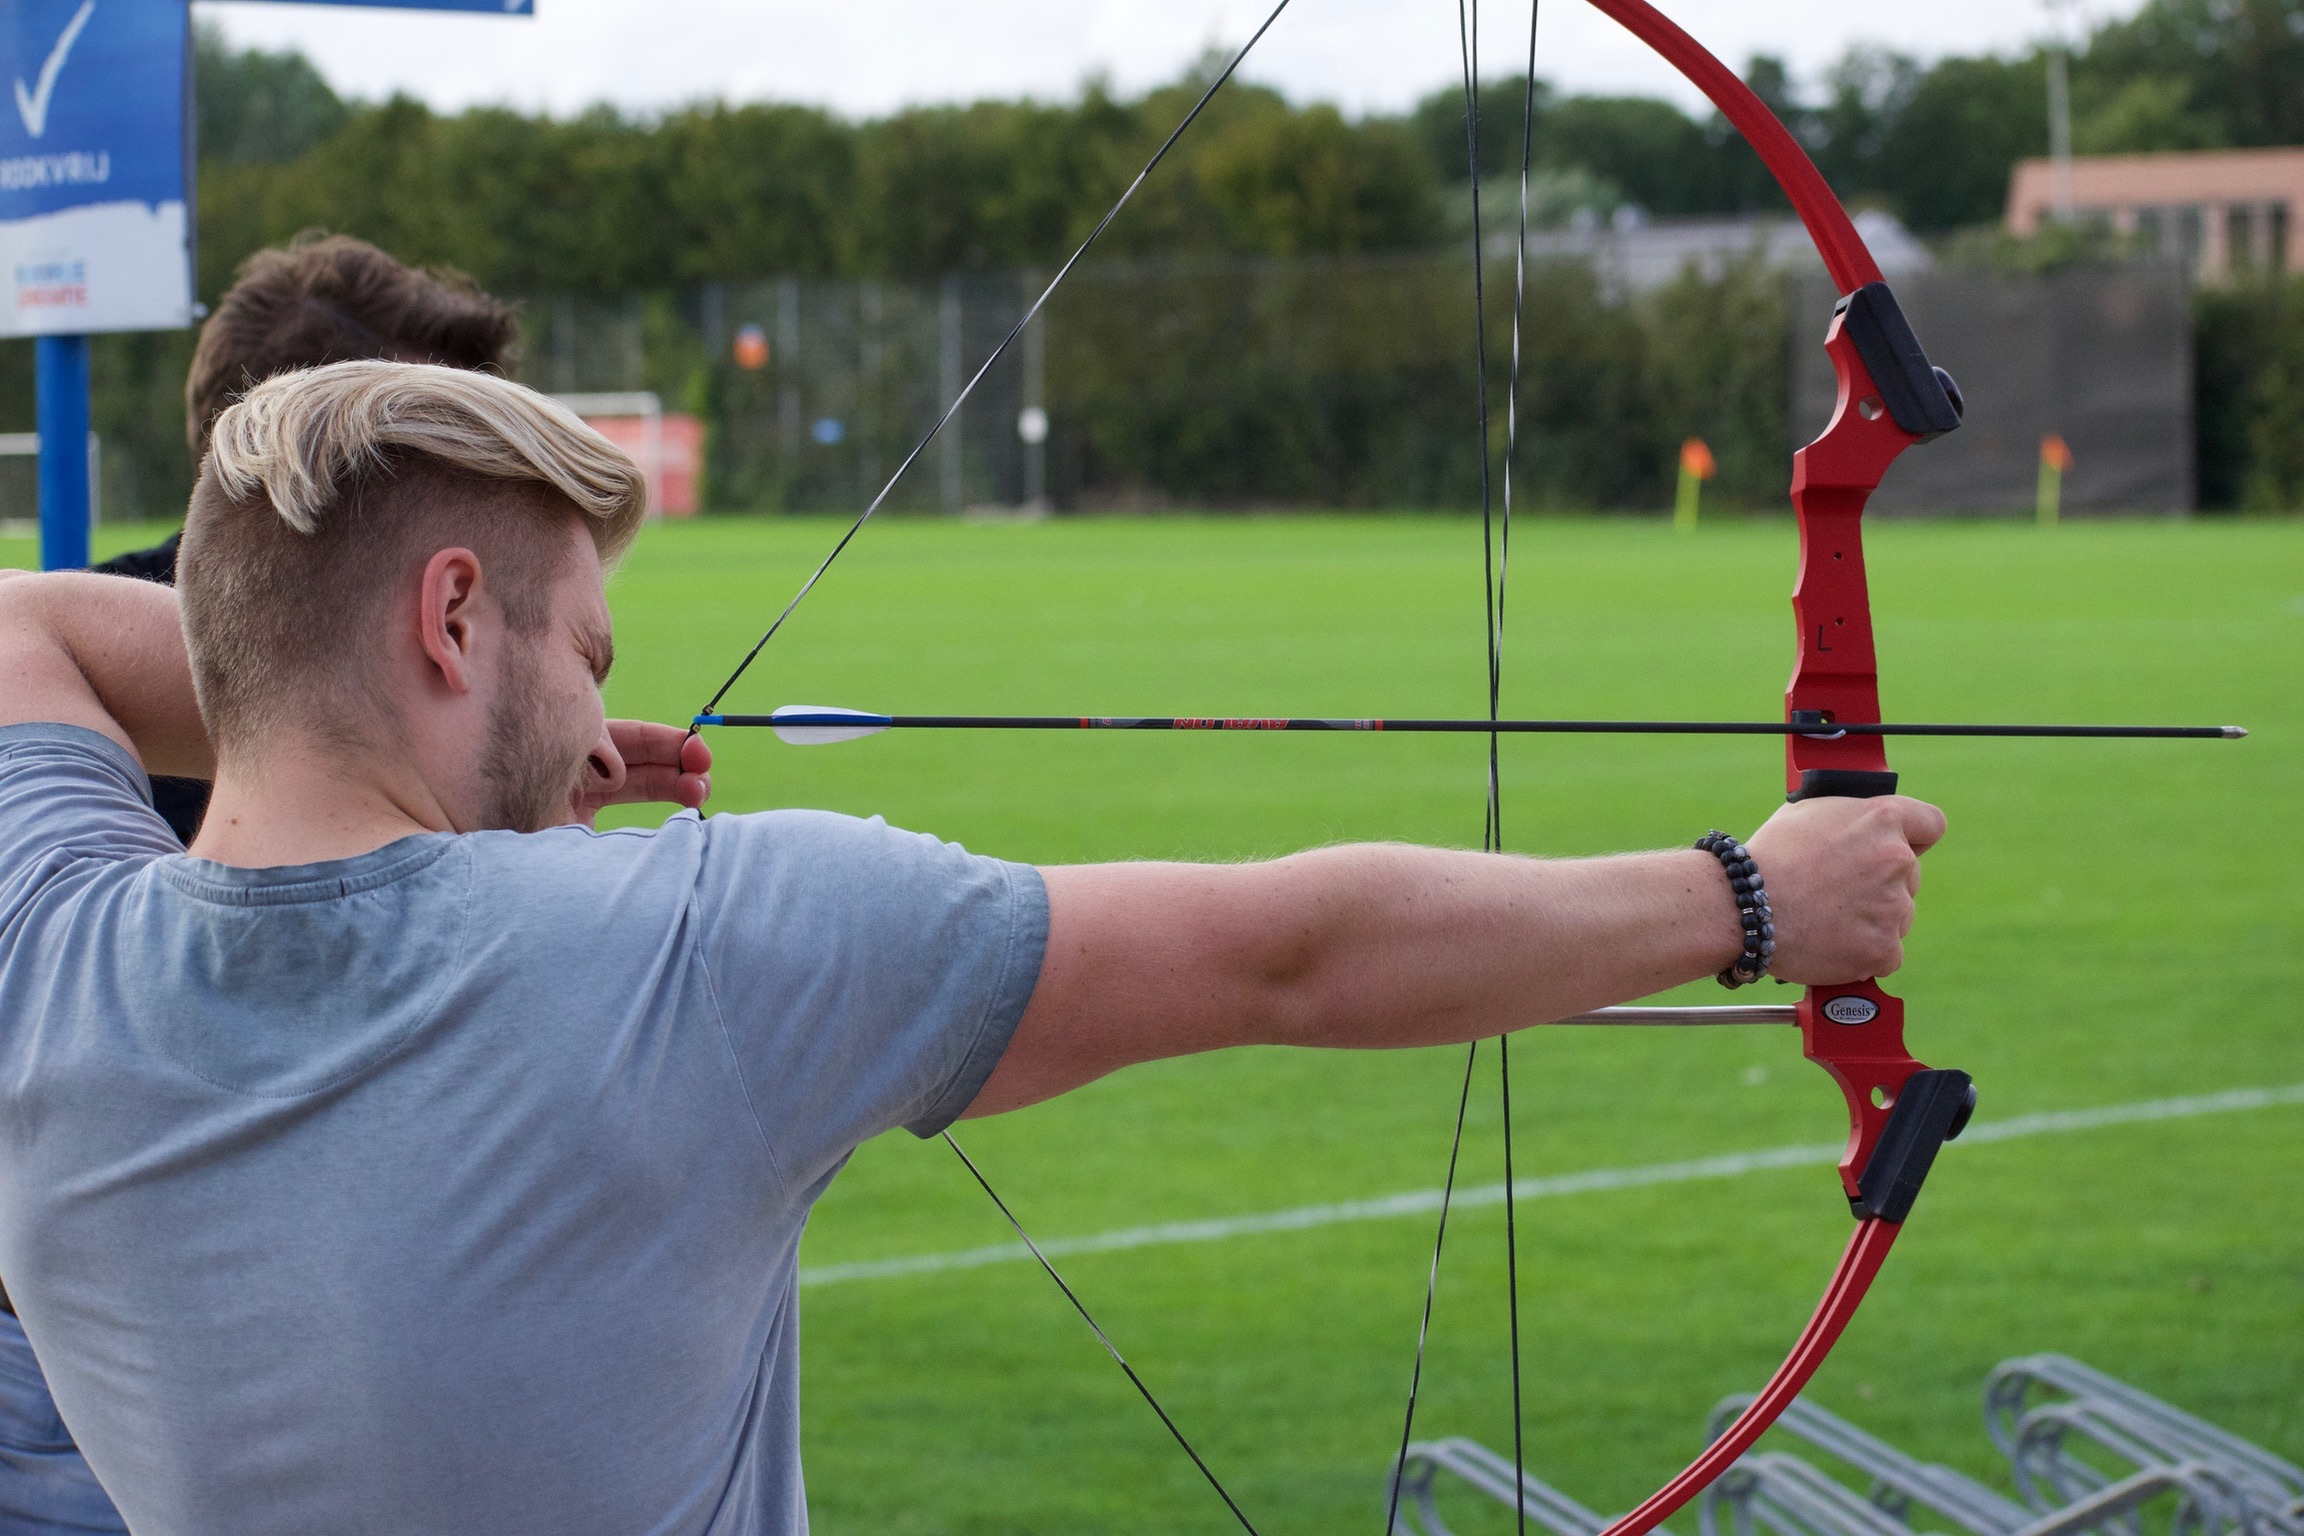 Buiten spelen archery Bas a